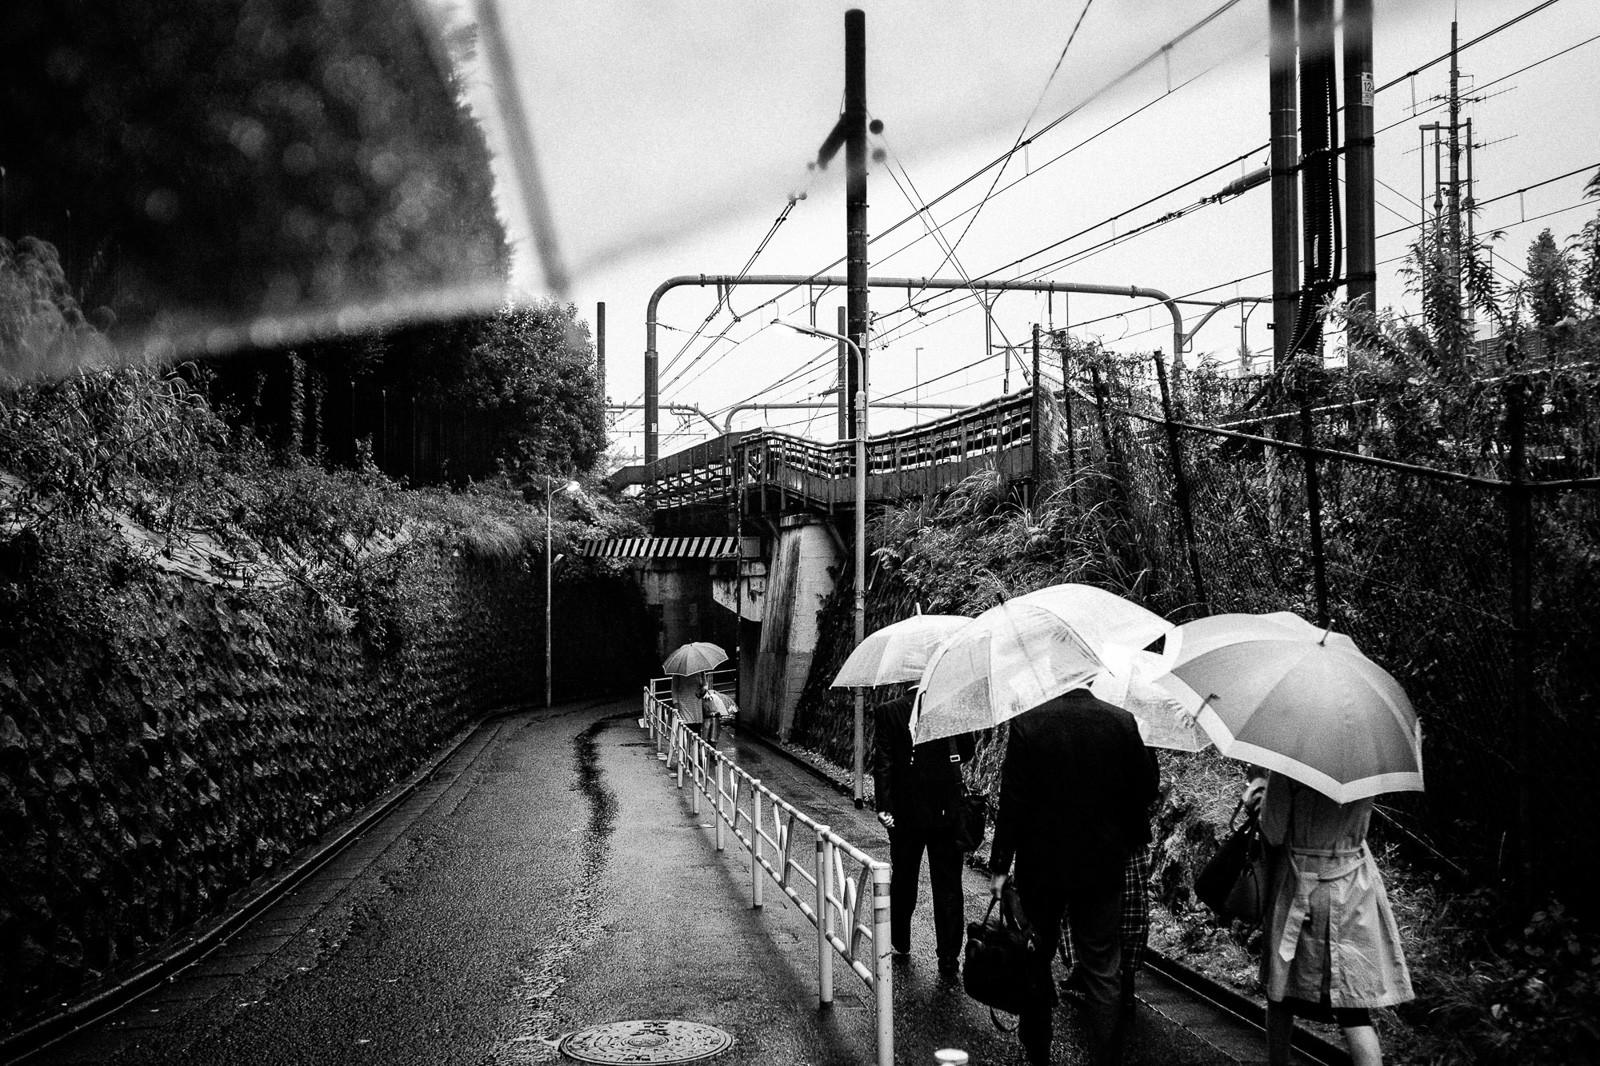 rainy walk in tokyo with umbrella blak and white